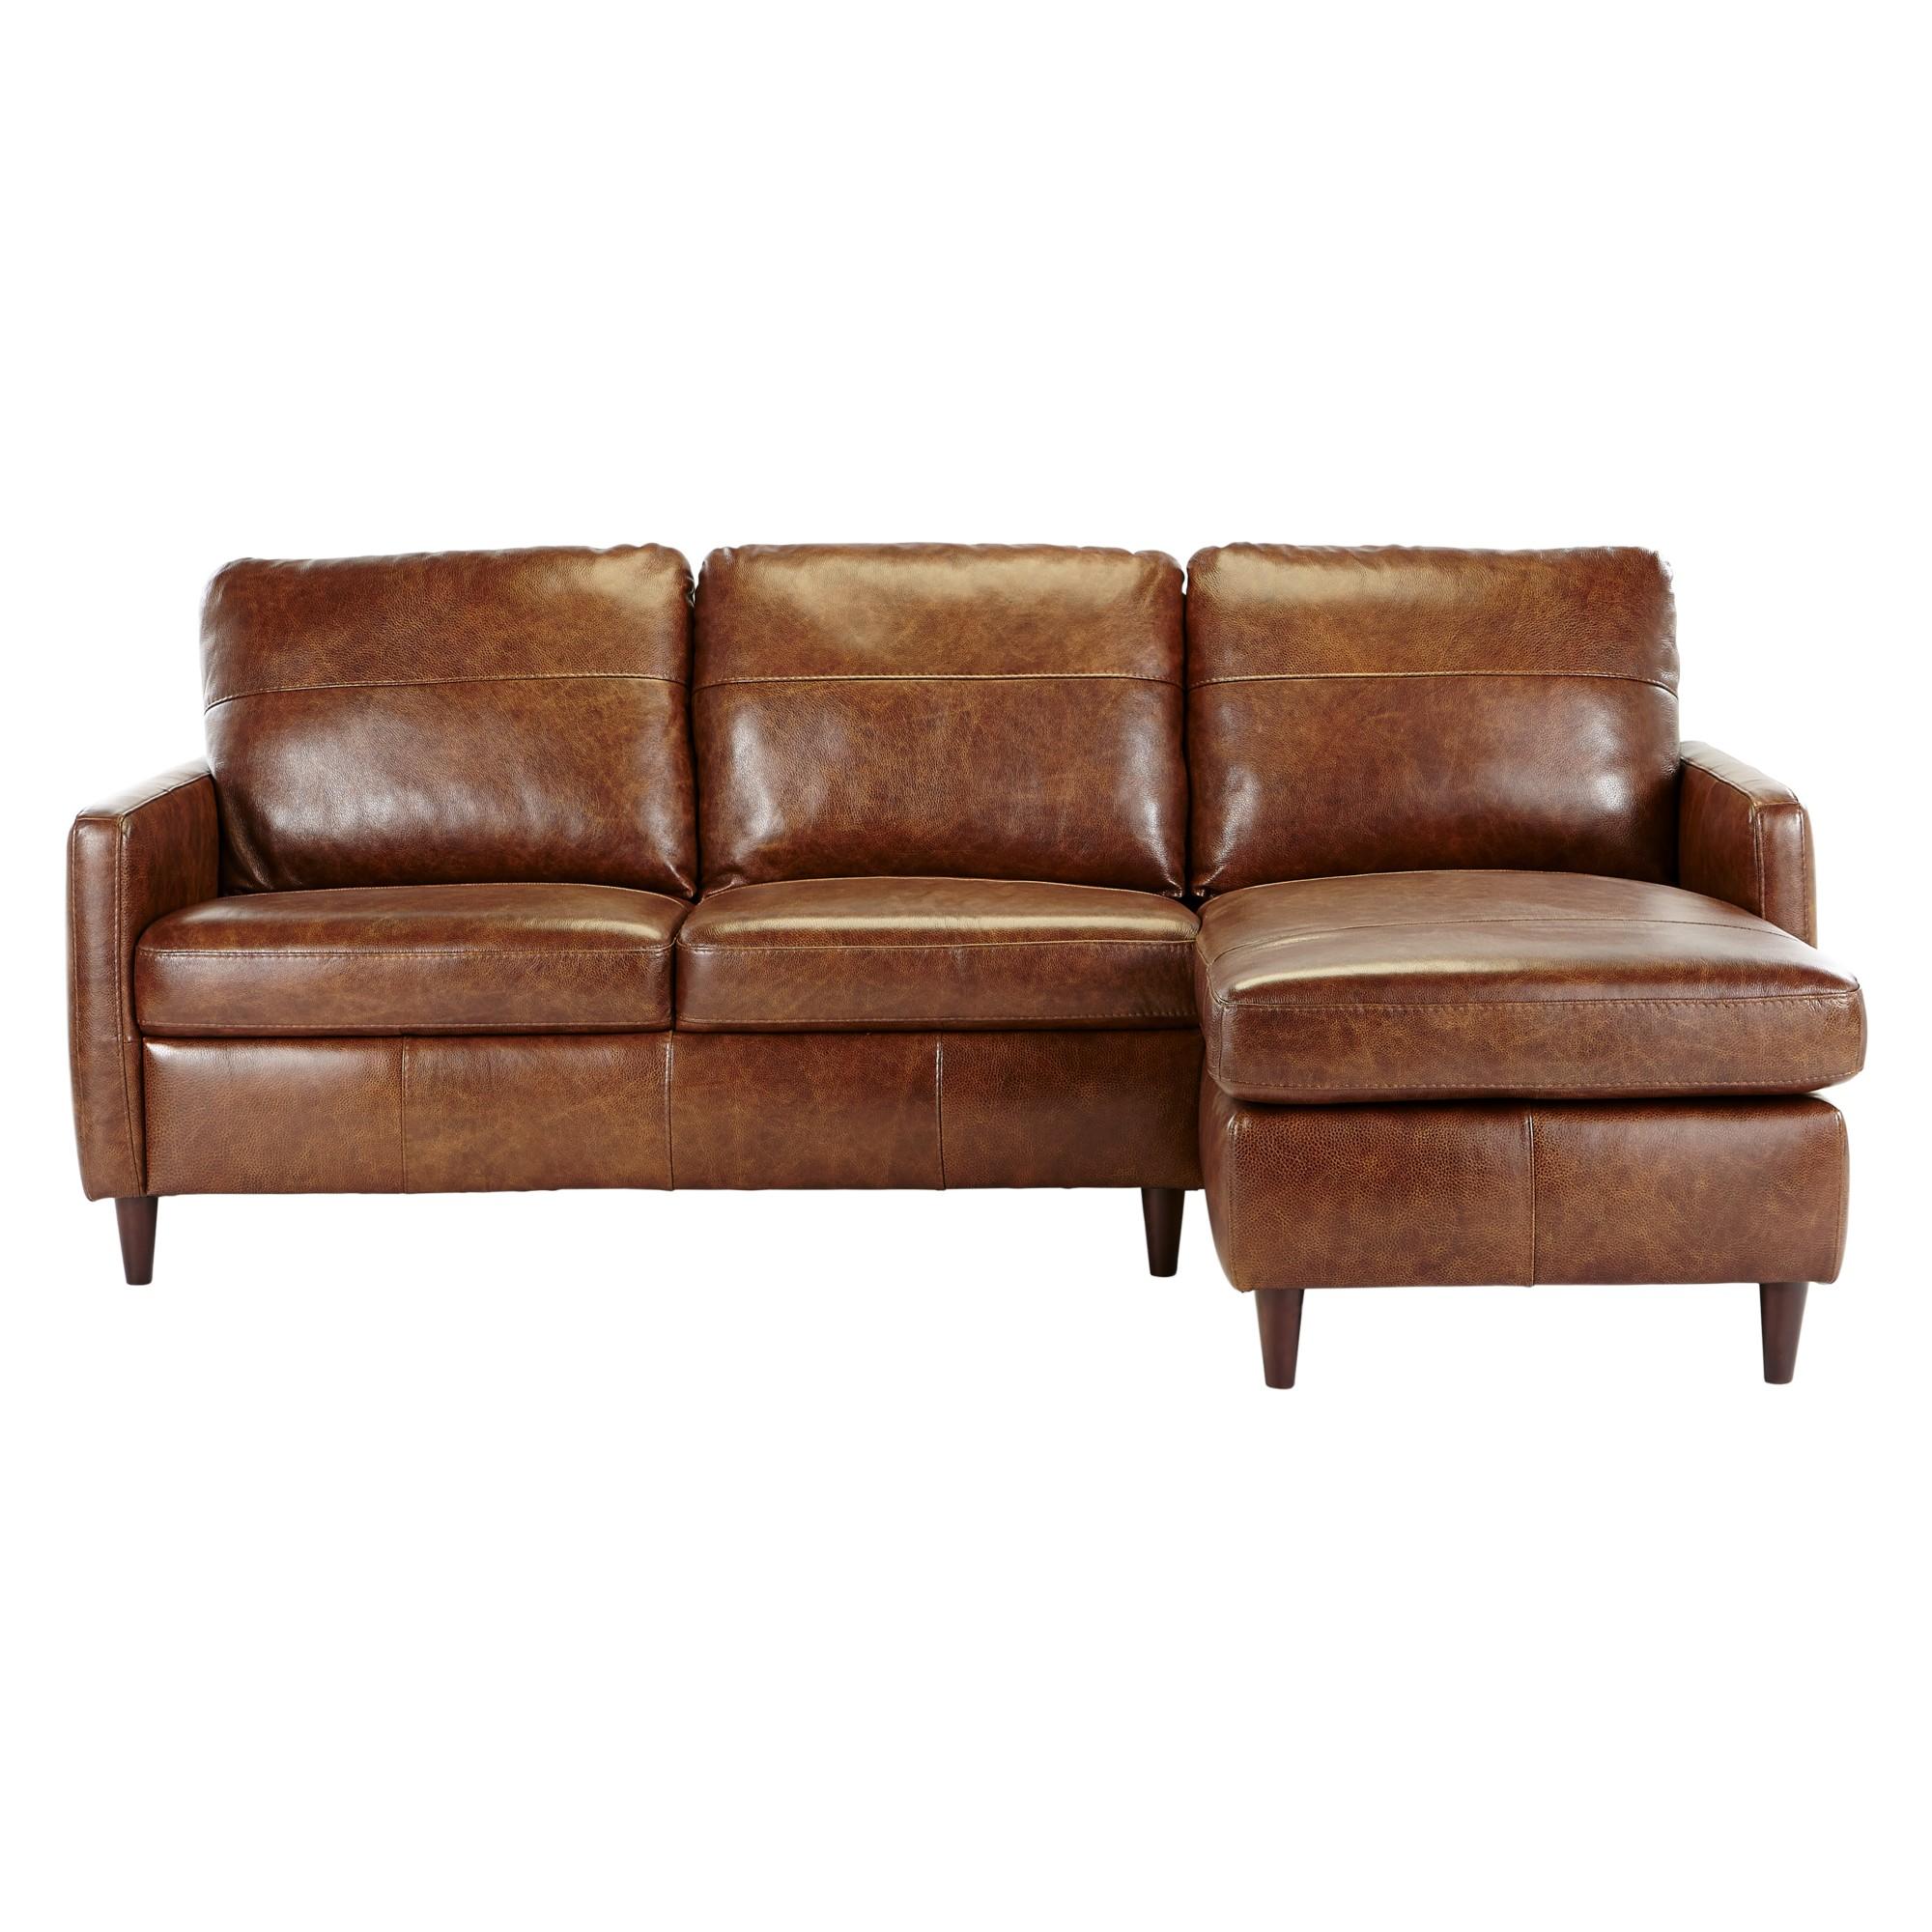 John Lewis Dalston Semi-Aniline Leather RHF Chaise End Sofa